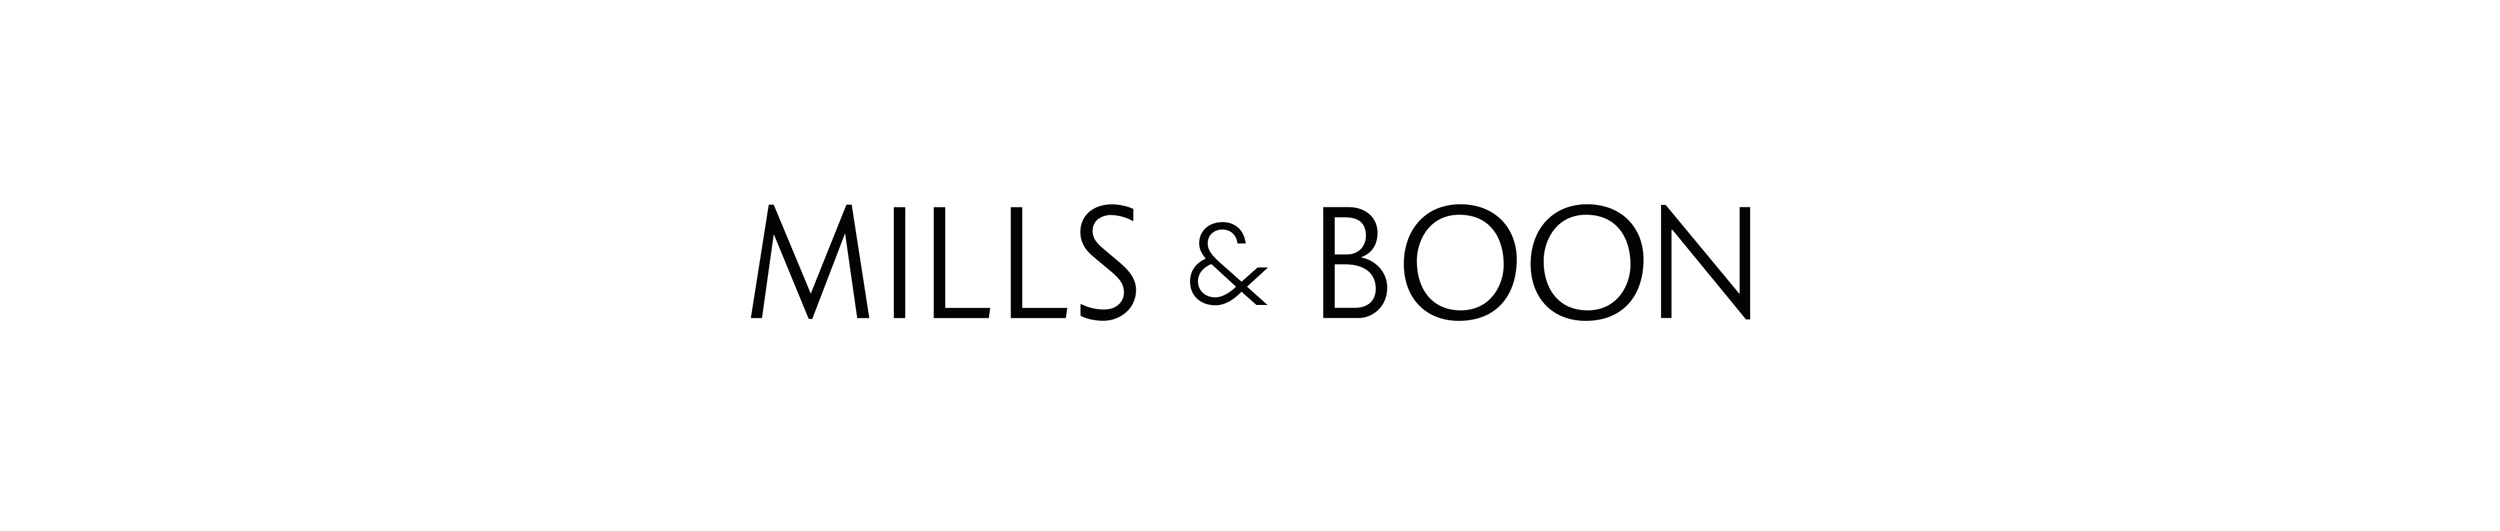 Charlotte_Willow_Retief_Mills_&_Boon_Logo_BW.jpg